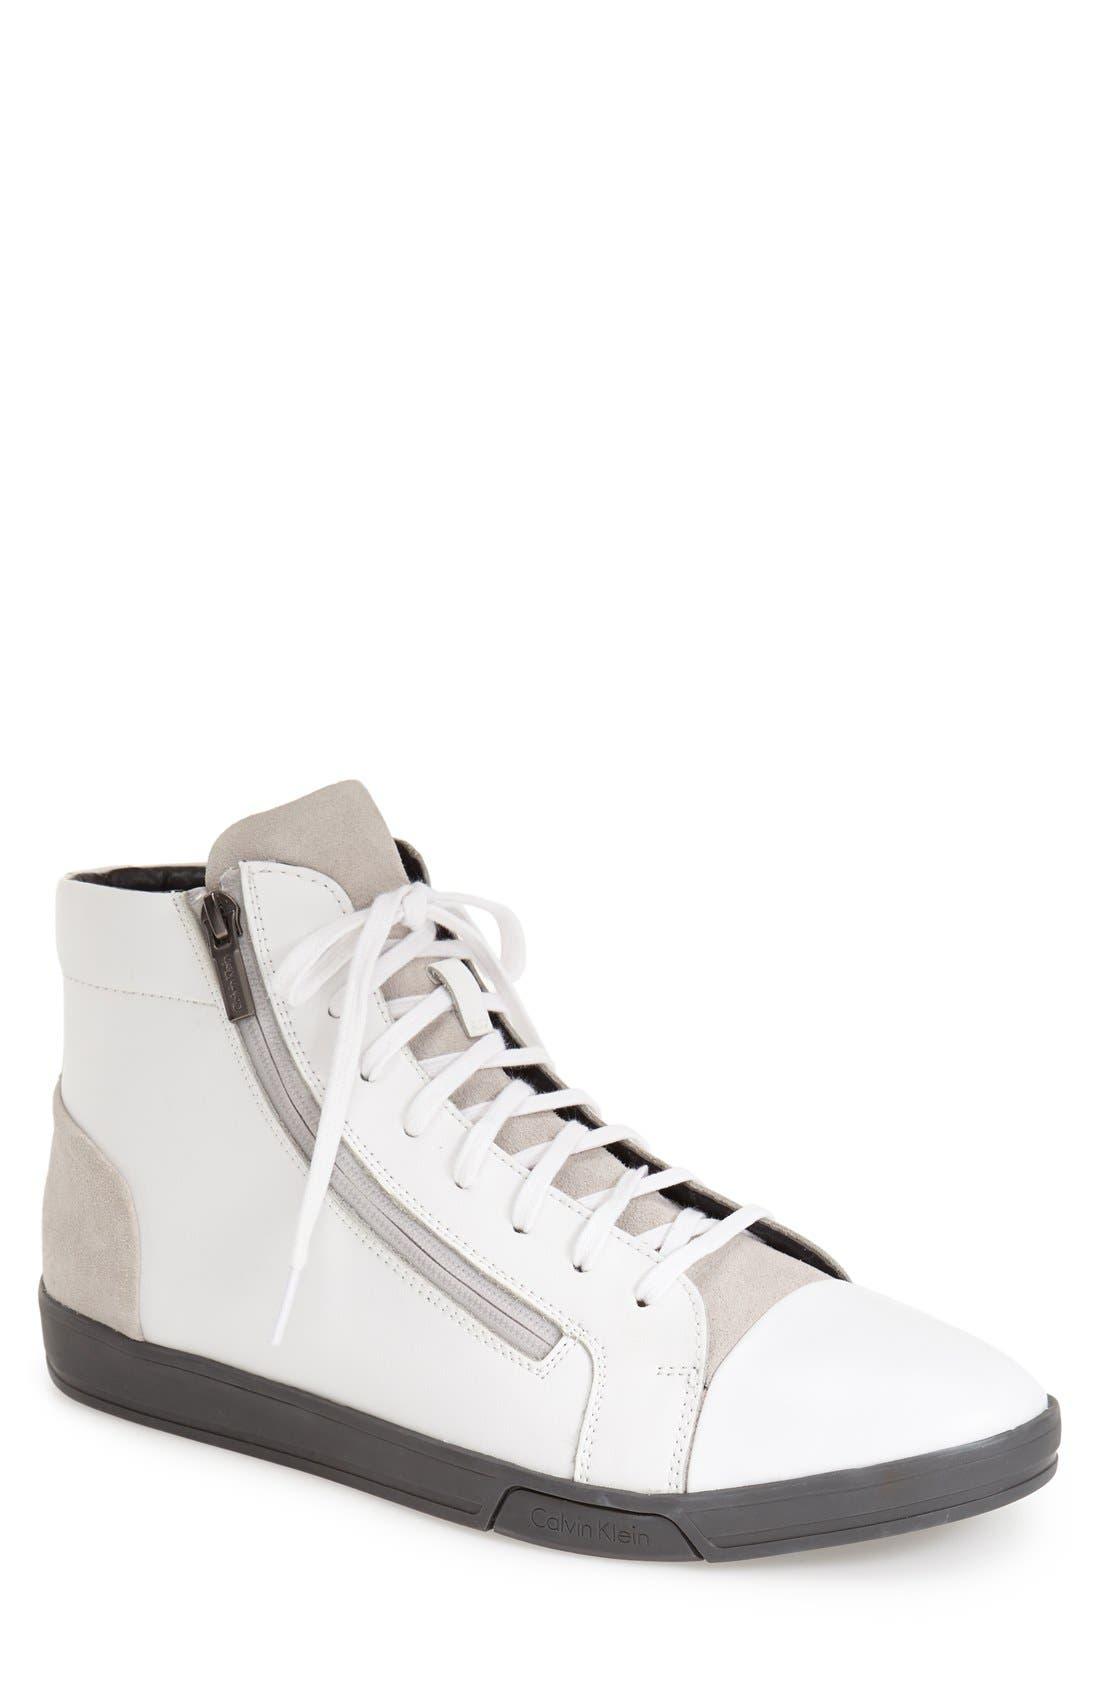 Alternate Image 1 Selected - Calvin Klein 'BerkeAction' Sneaker (Men)